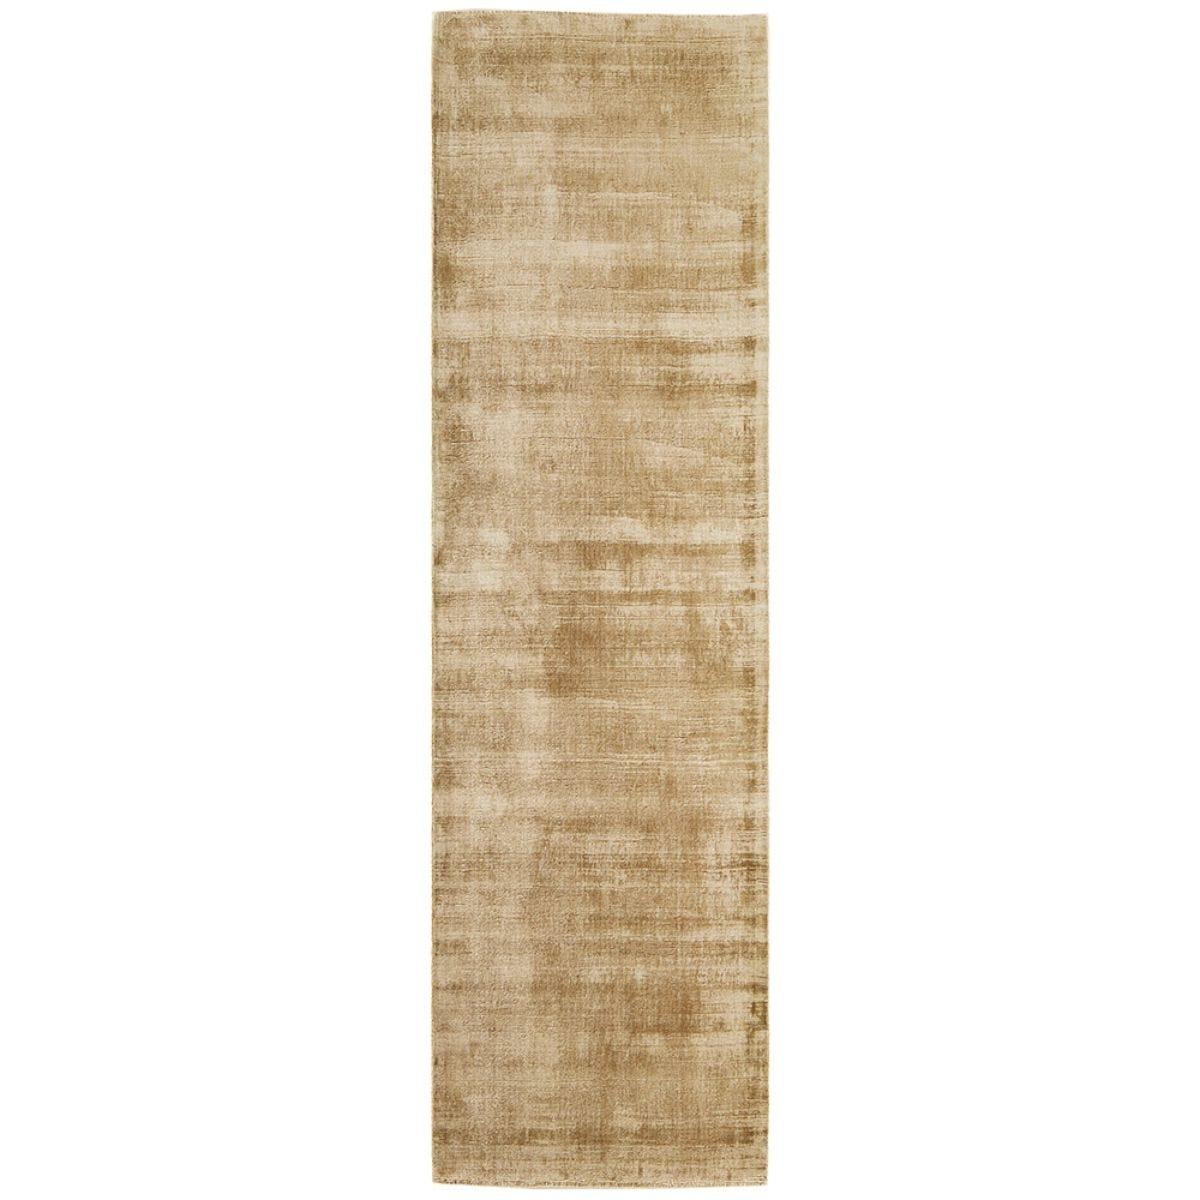 Asiatic Blade Runner Floor Rug, 66 x 240cm - Champagne